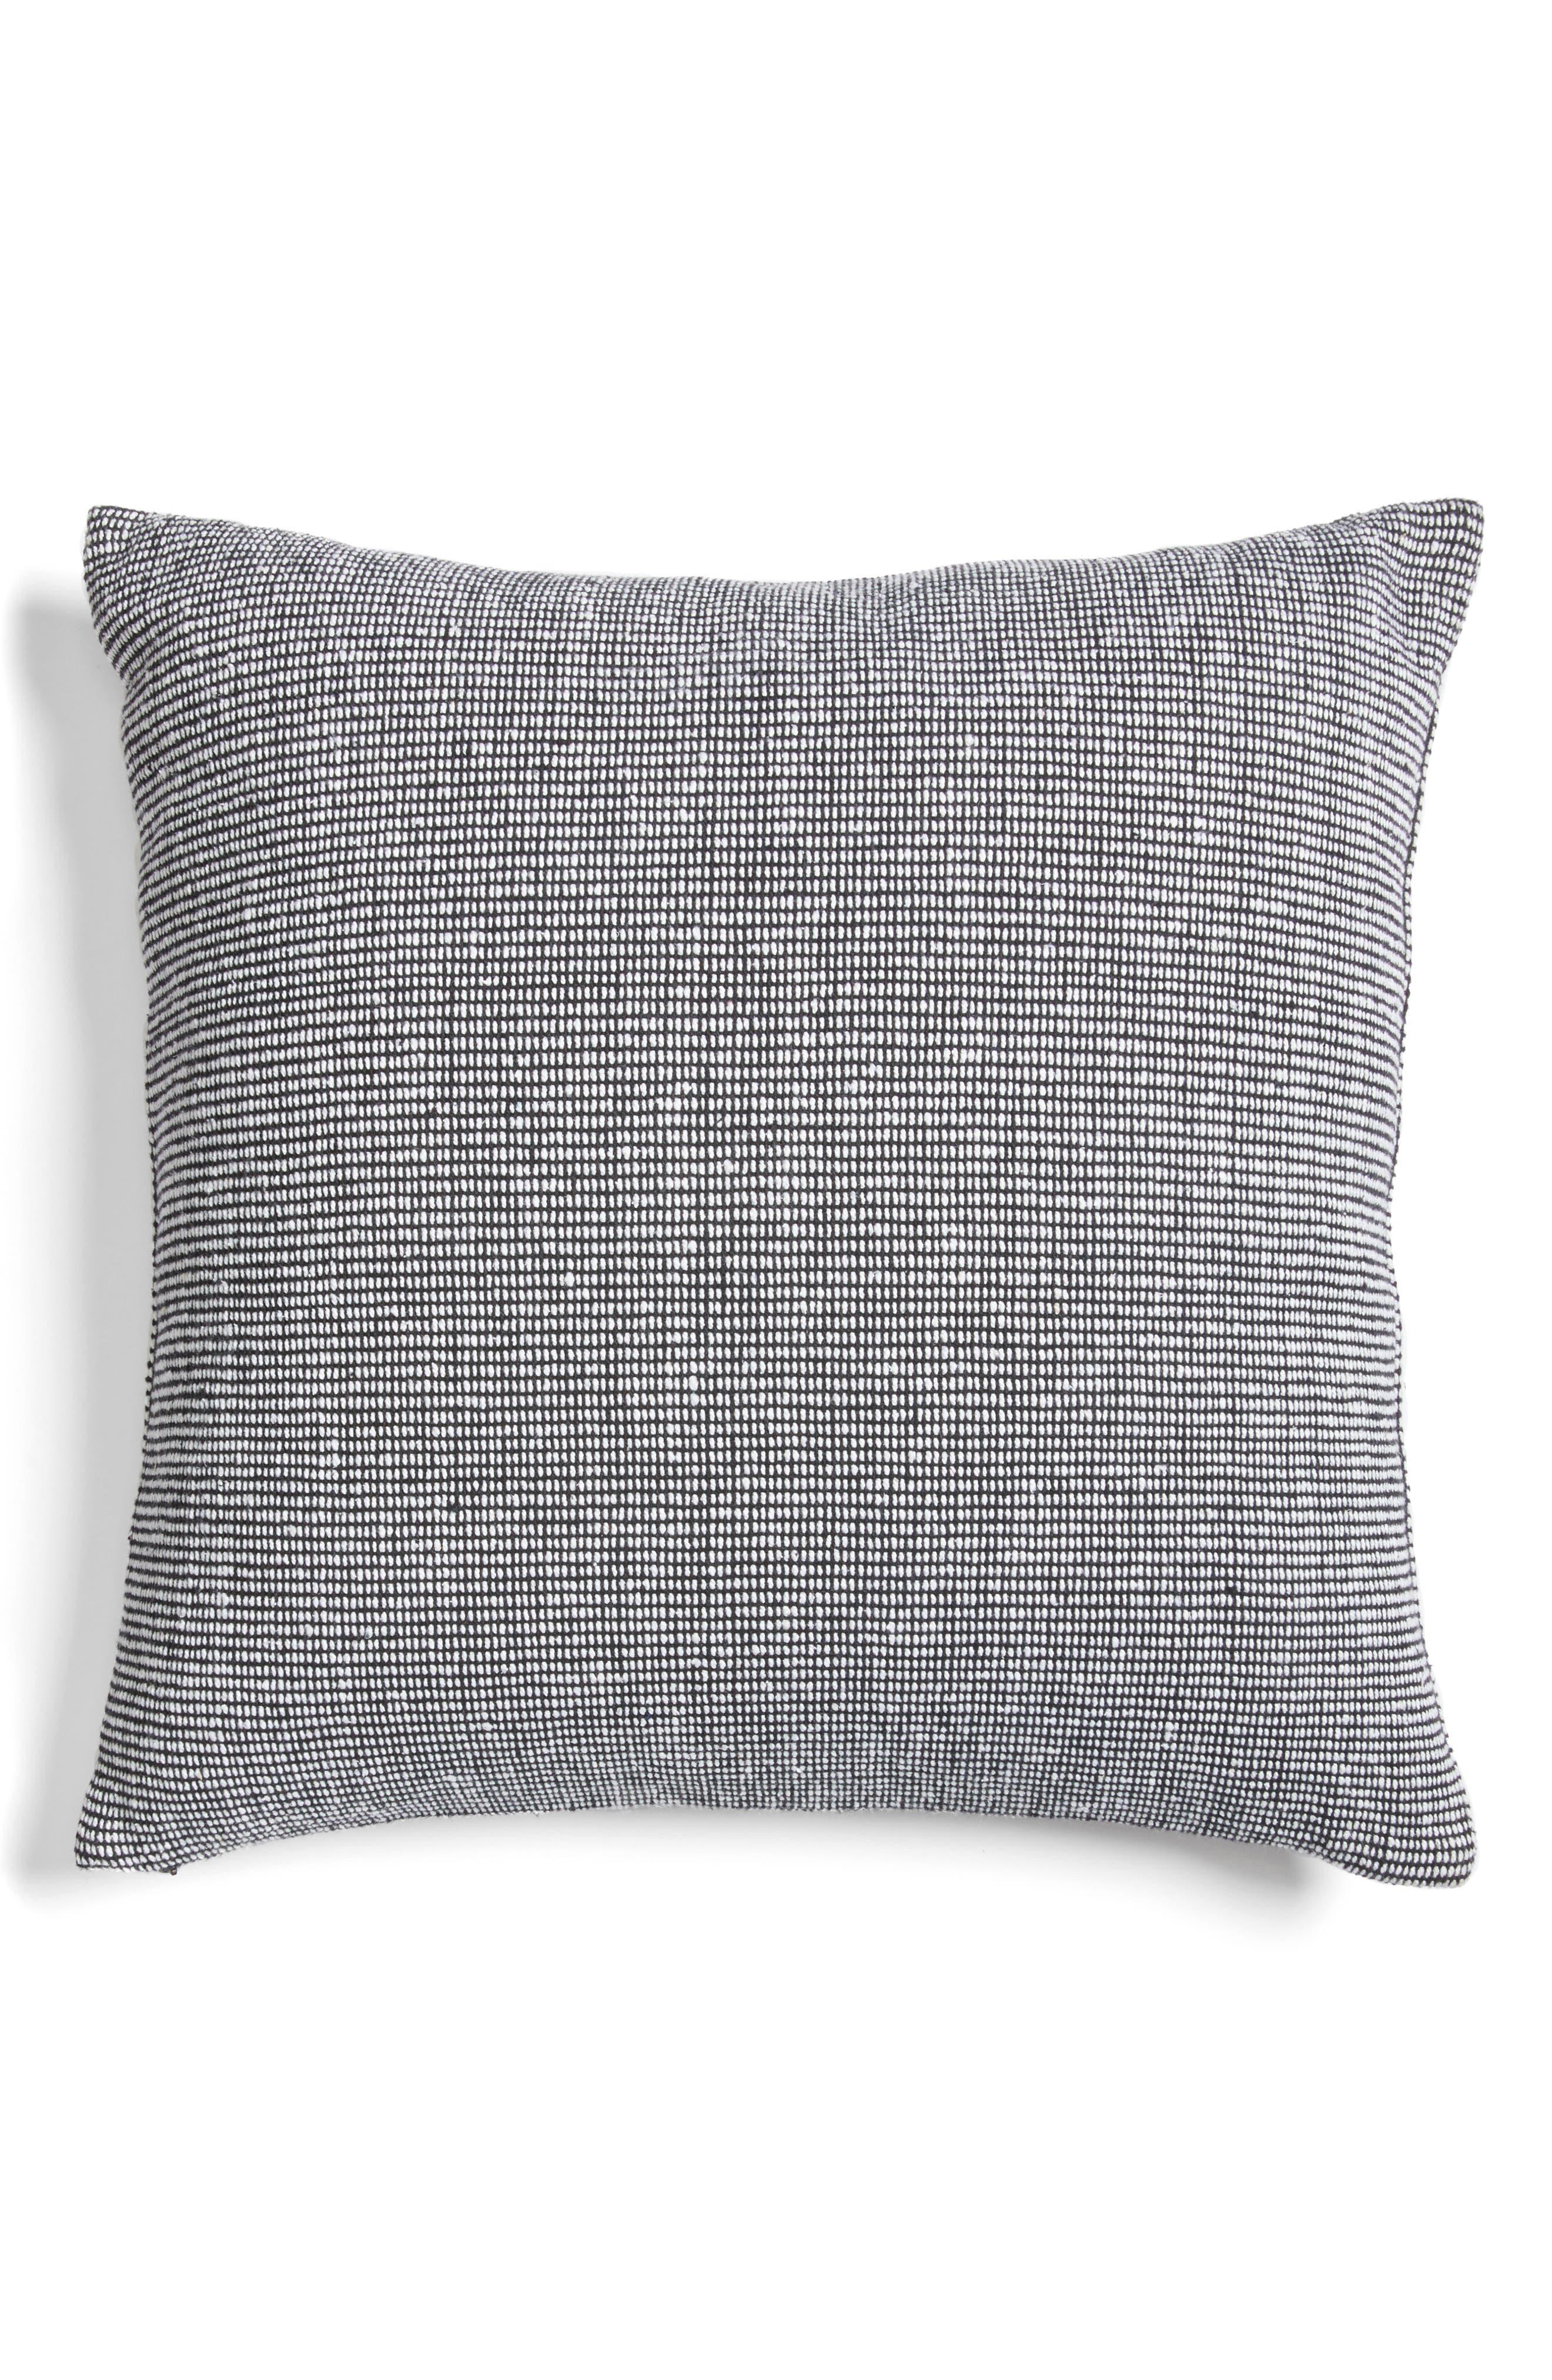 Structure Pillow,                             Main thumbnail 1, color,                             BLACK/ WHITE